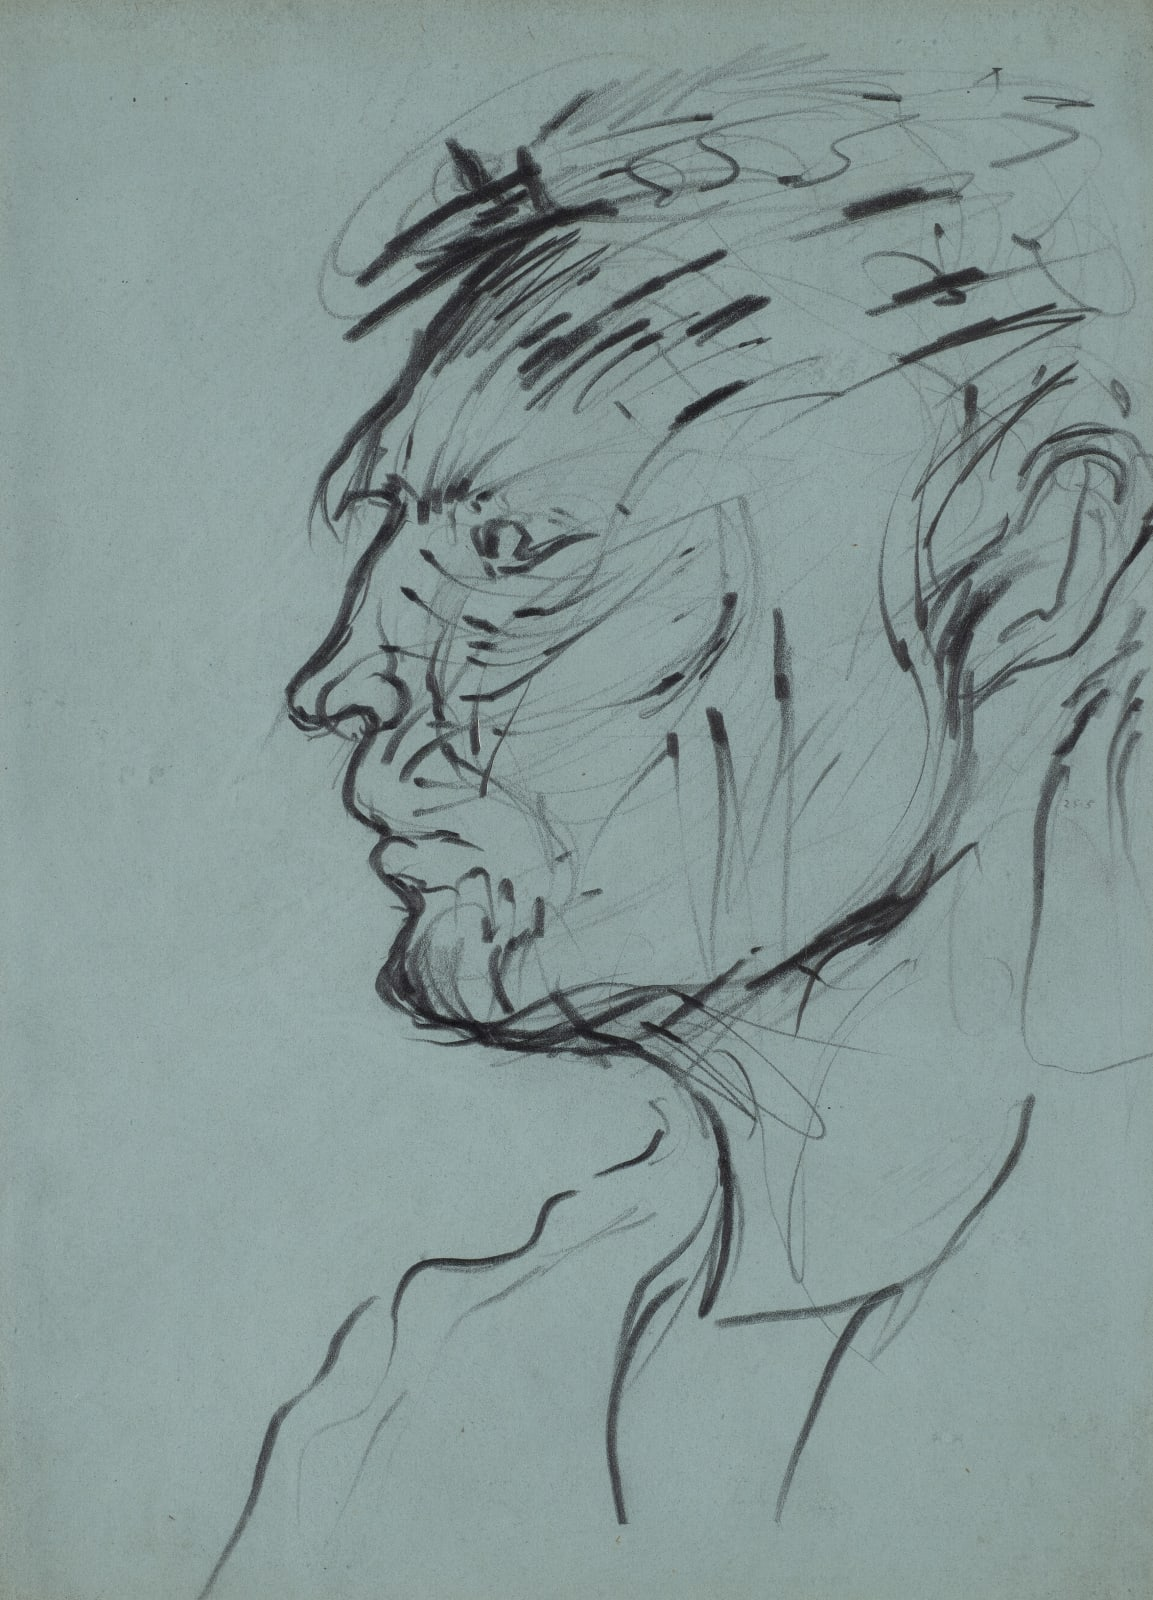 Gustav Metzger Head of a Man, 1948-49, Pencil on paper 39 x 30cm. The Gustav Metzger Foundation